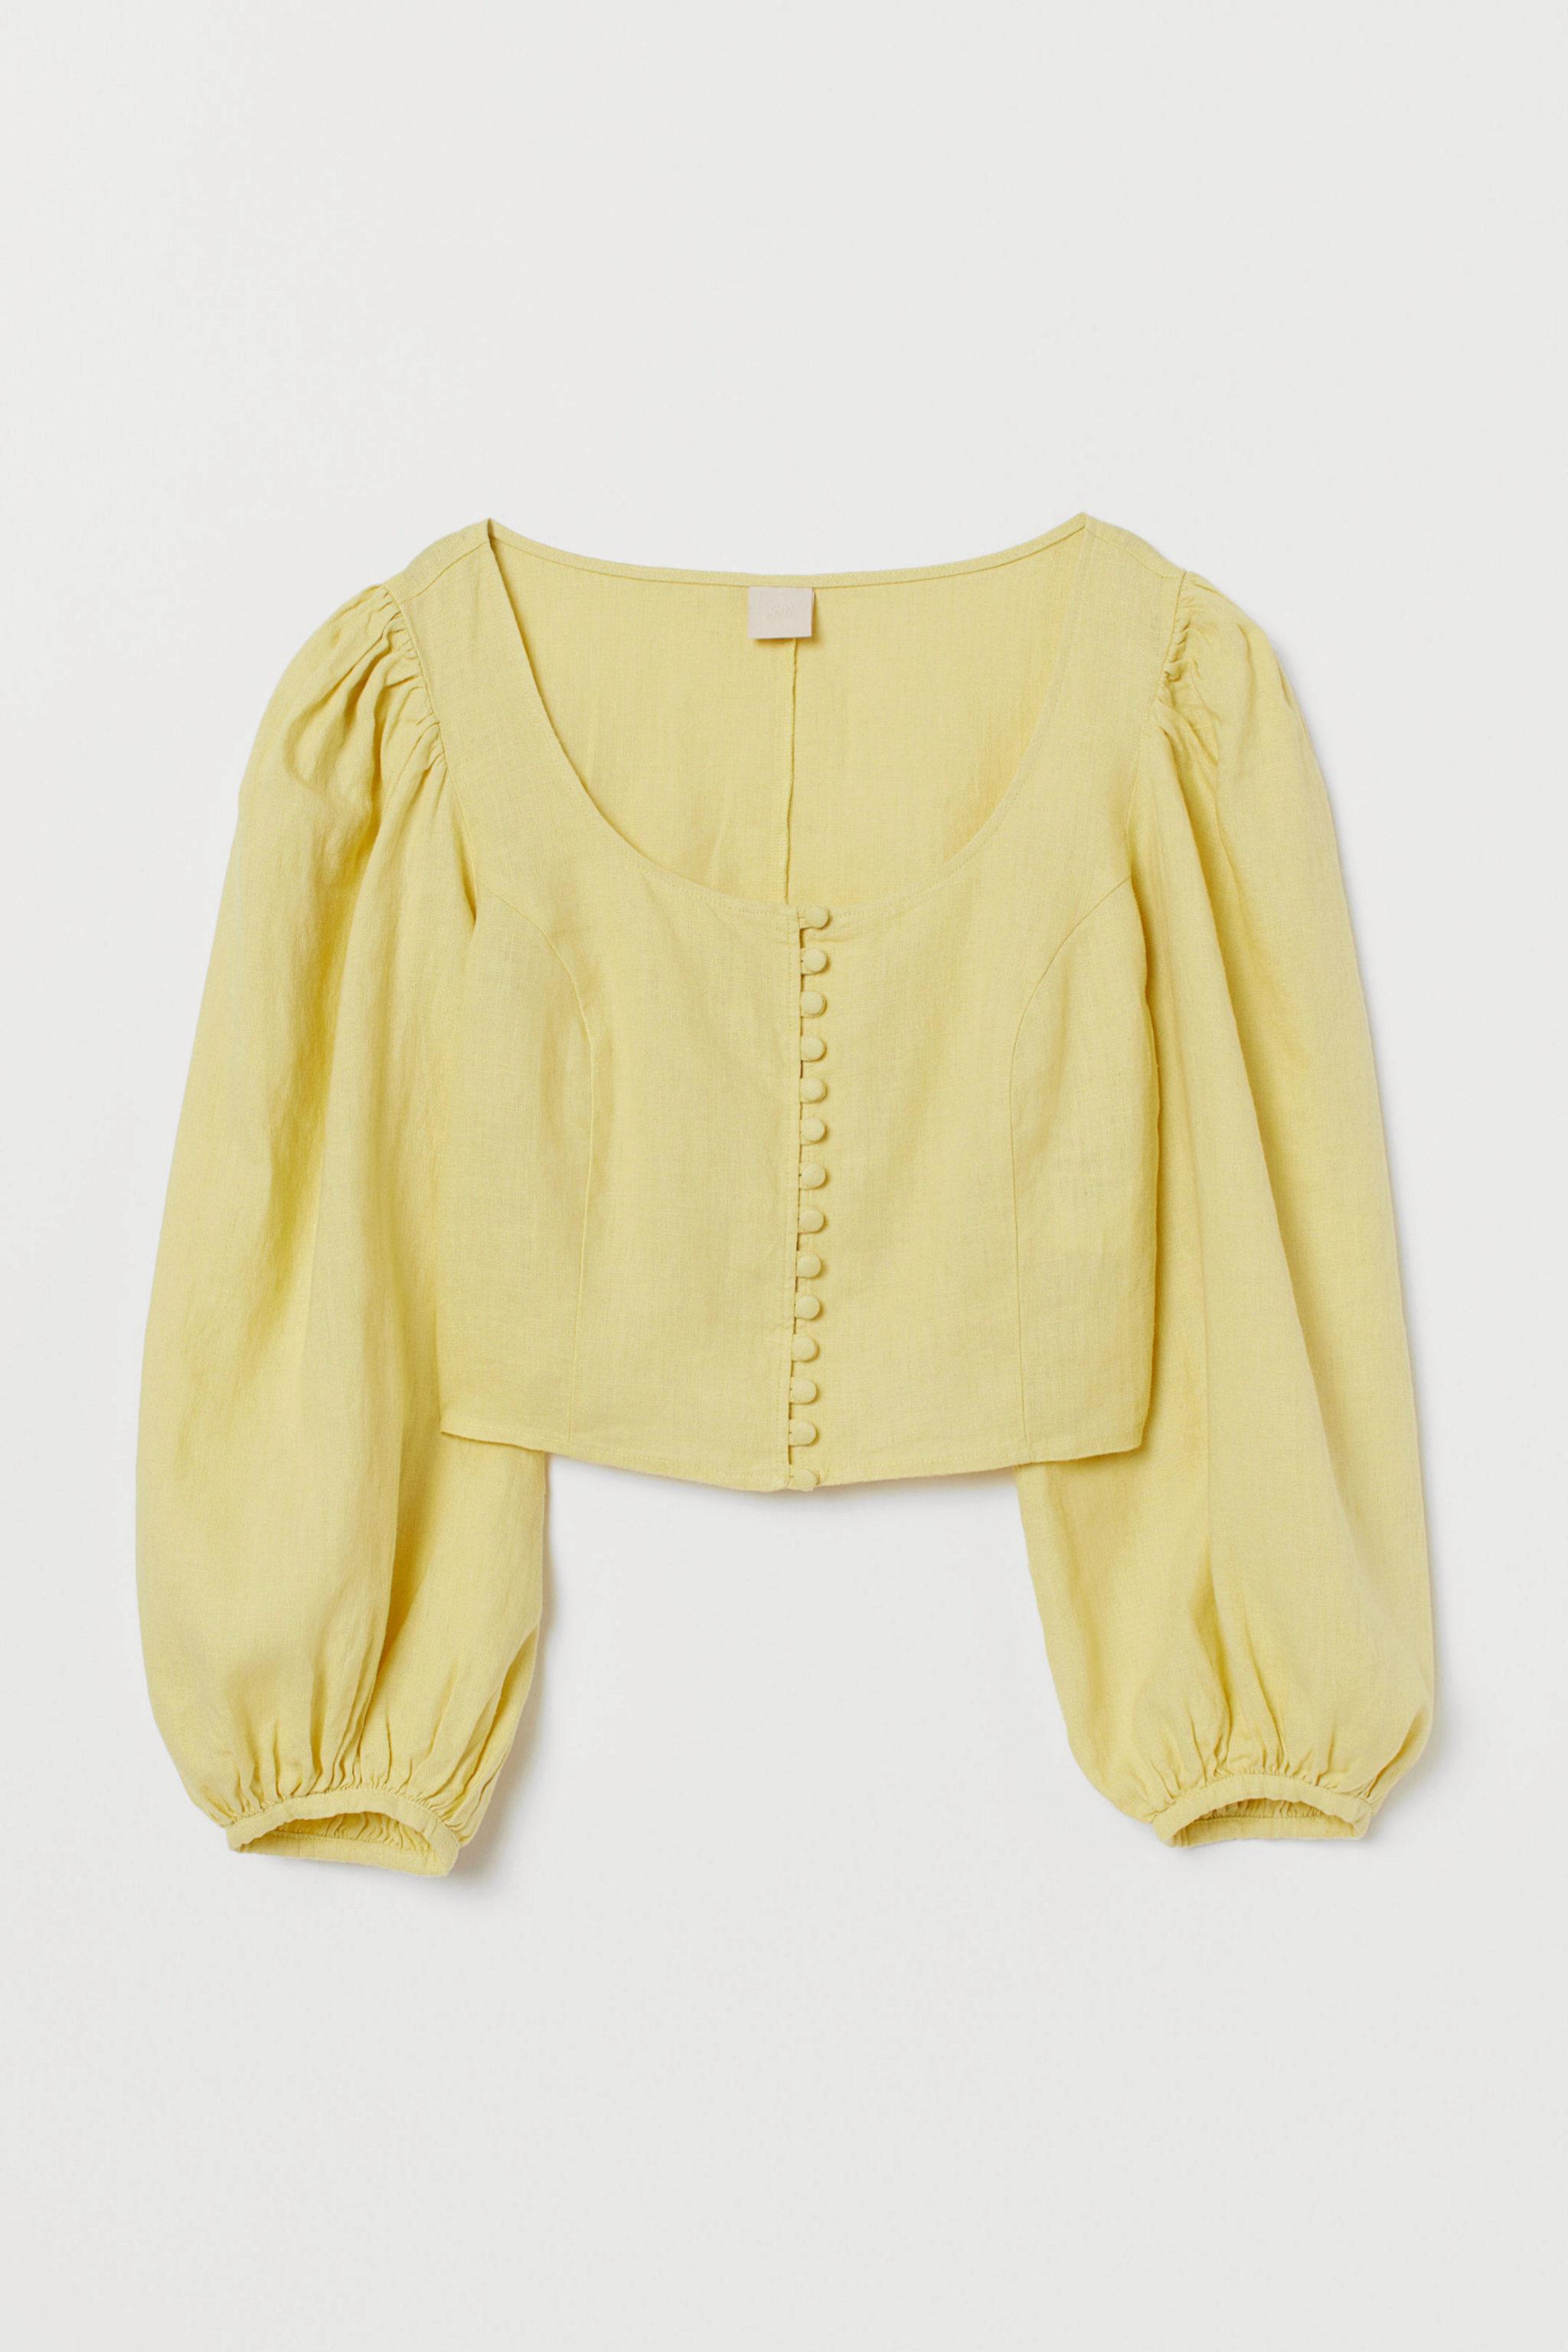 Blusa con mangas abullonadas de H&M